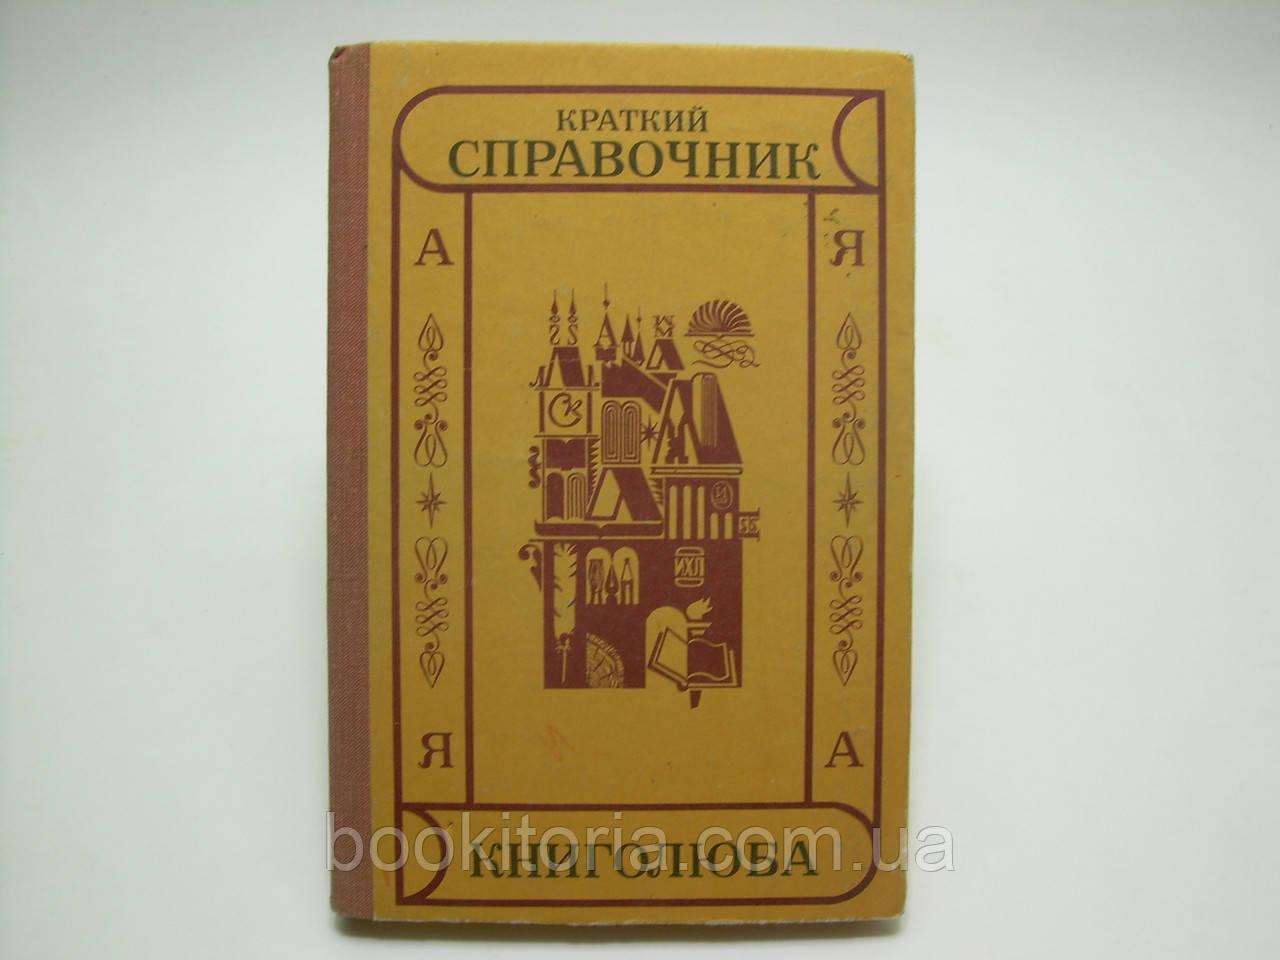 Краткий справочник книголюба (б/у).